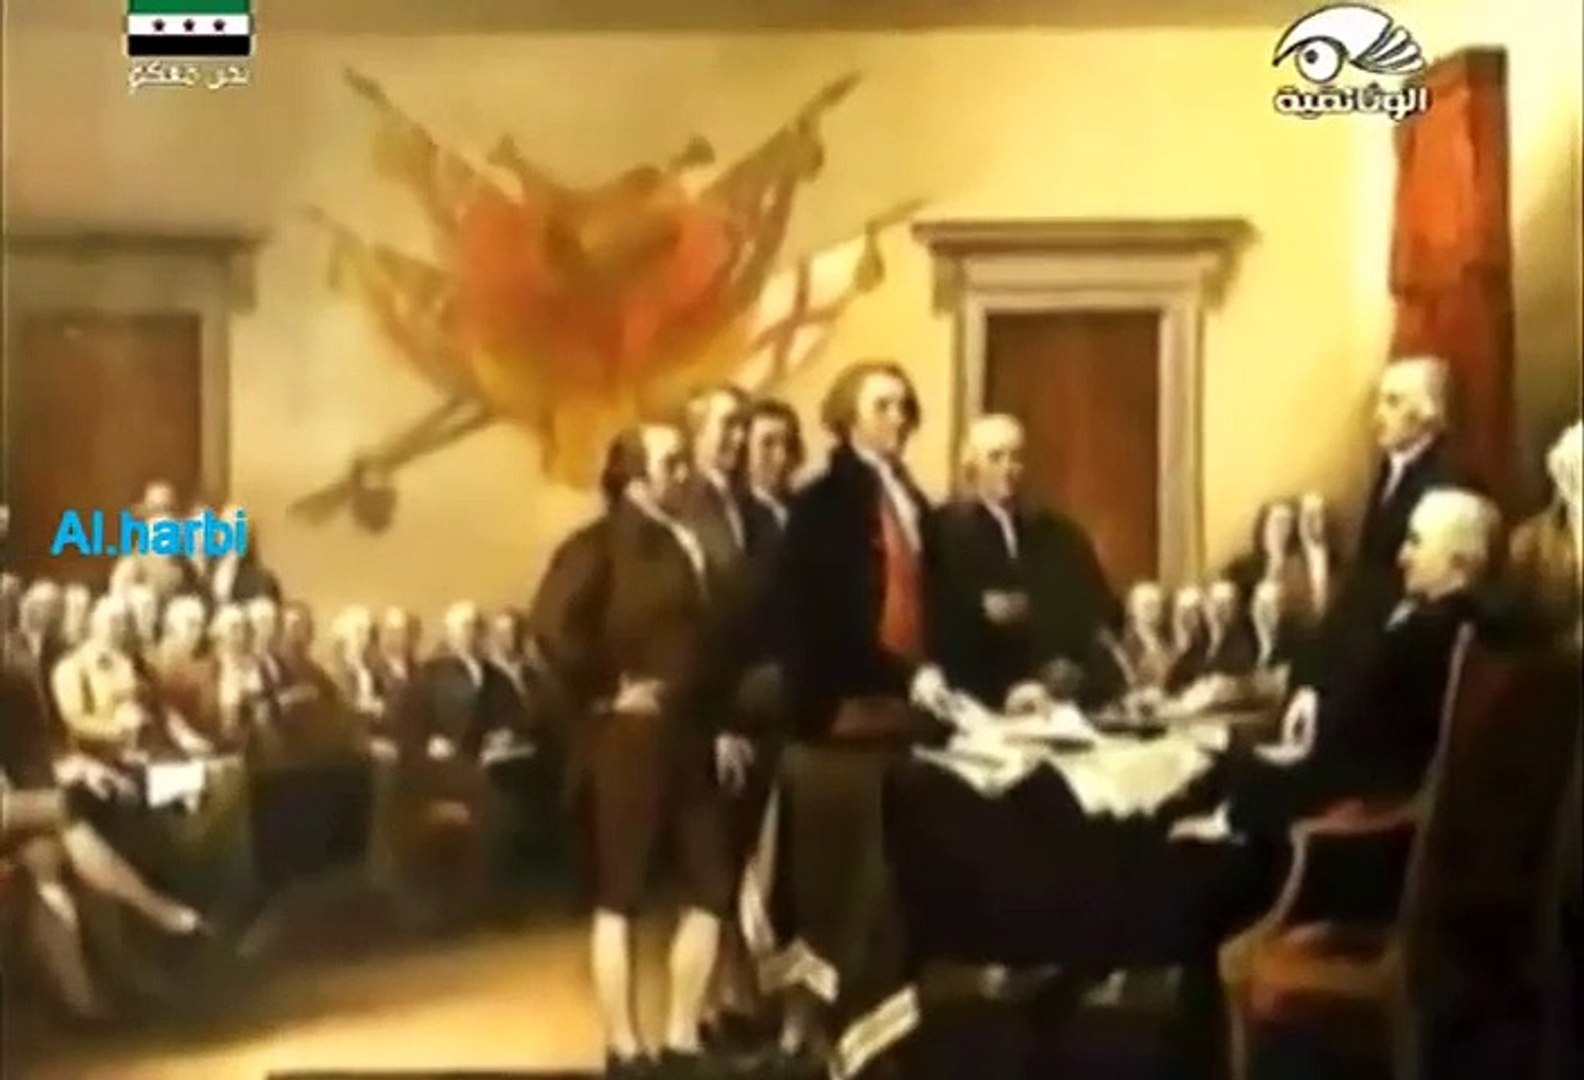 وثائقي الرئيس الامريكي ولسون